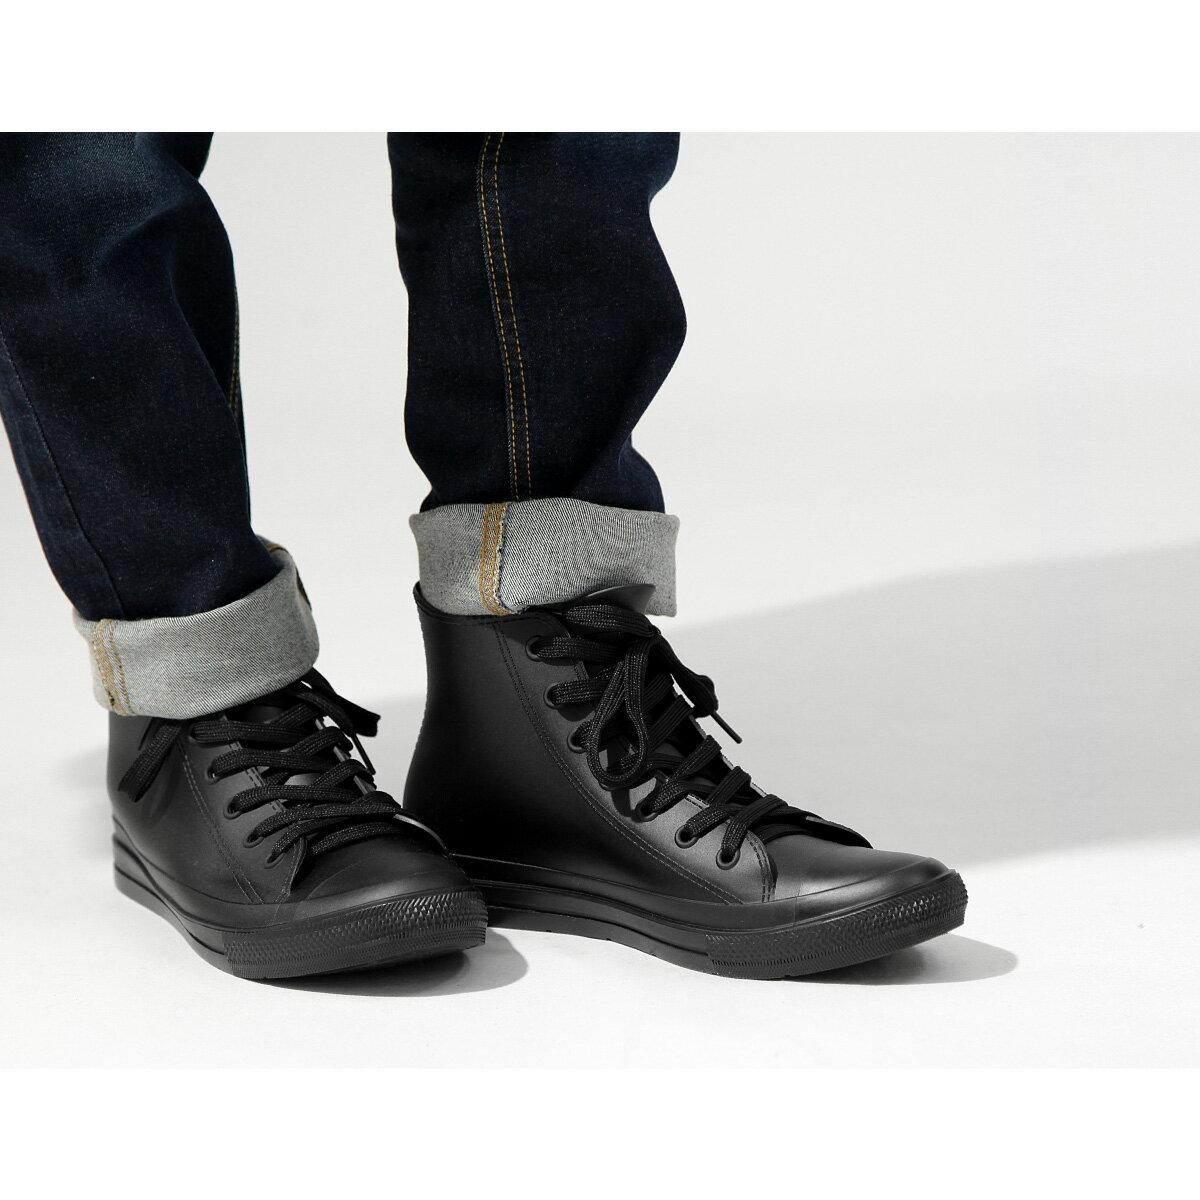 【New】ZIP 長筒 綁鞋帶雨鞋 2